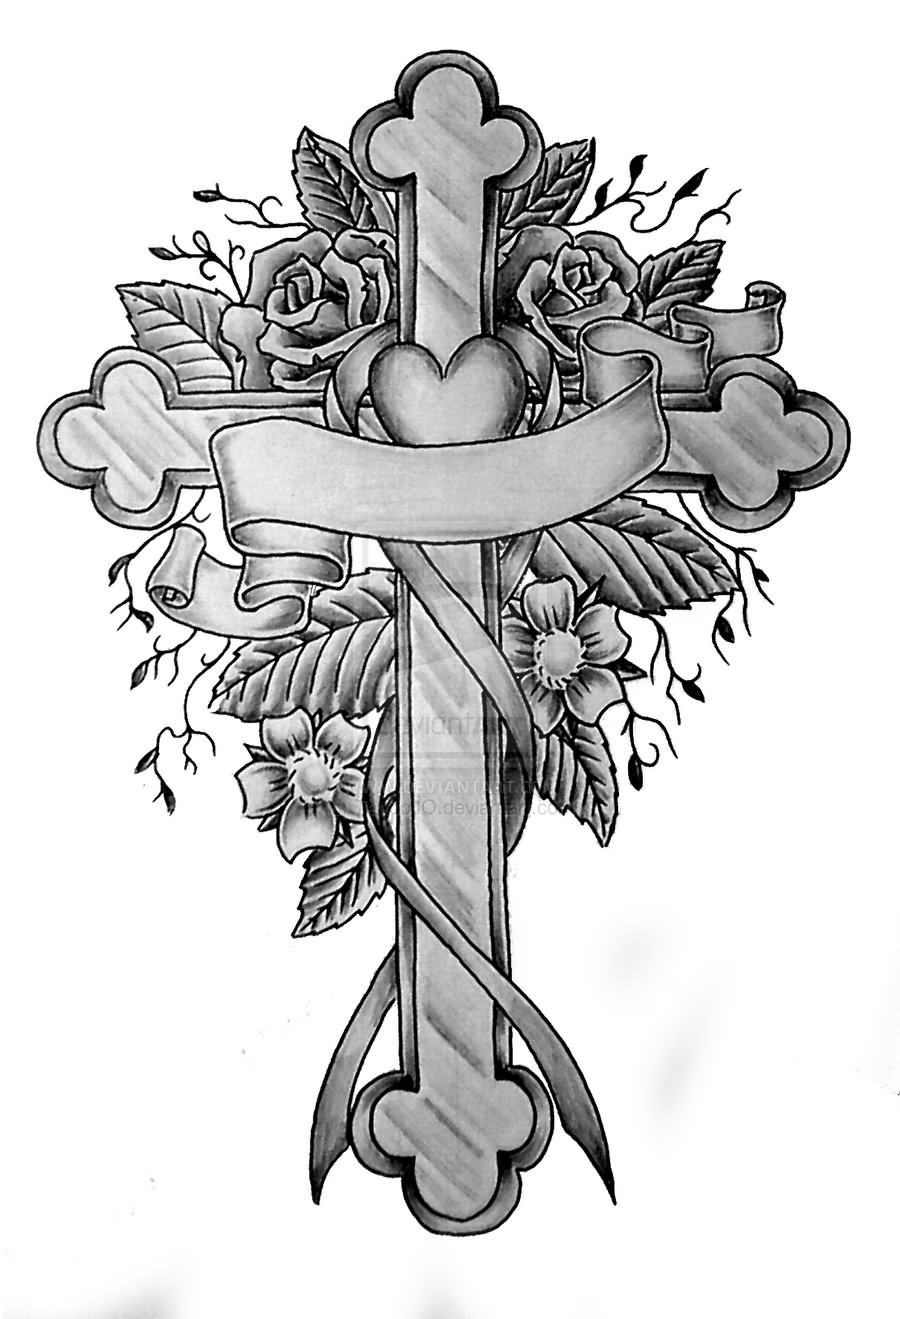 5 memorial tattoo designs. Black Bedroom Furniture Sets. Home Design Ideas